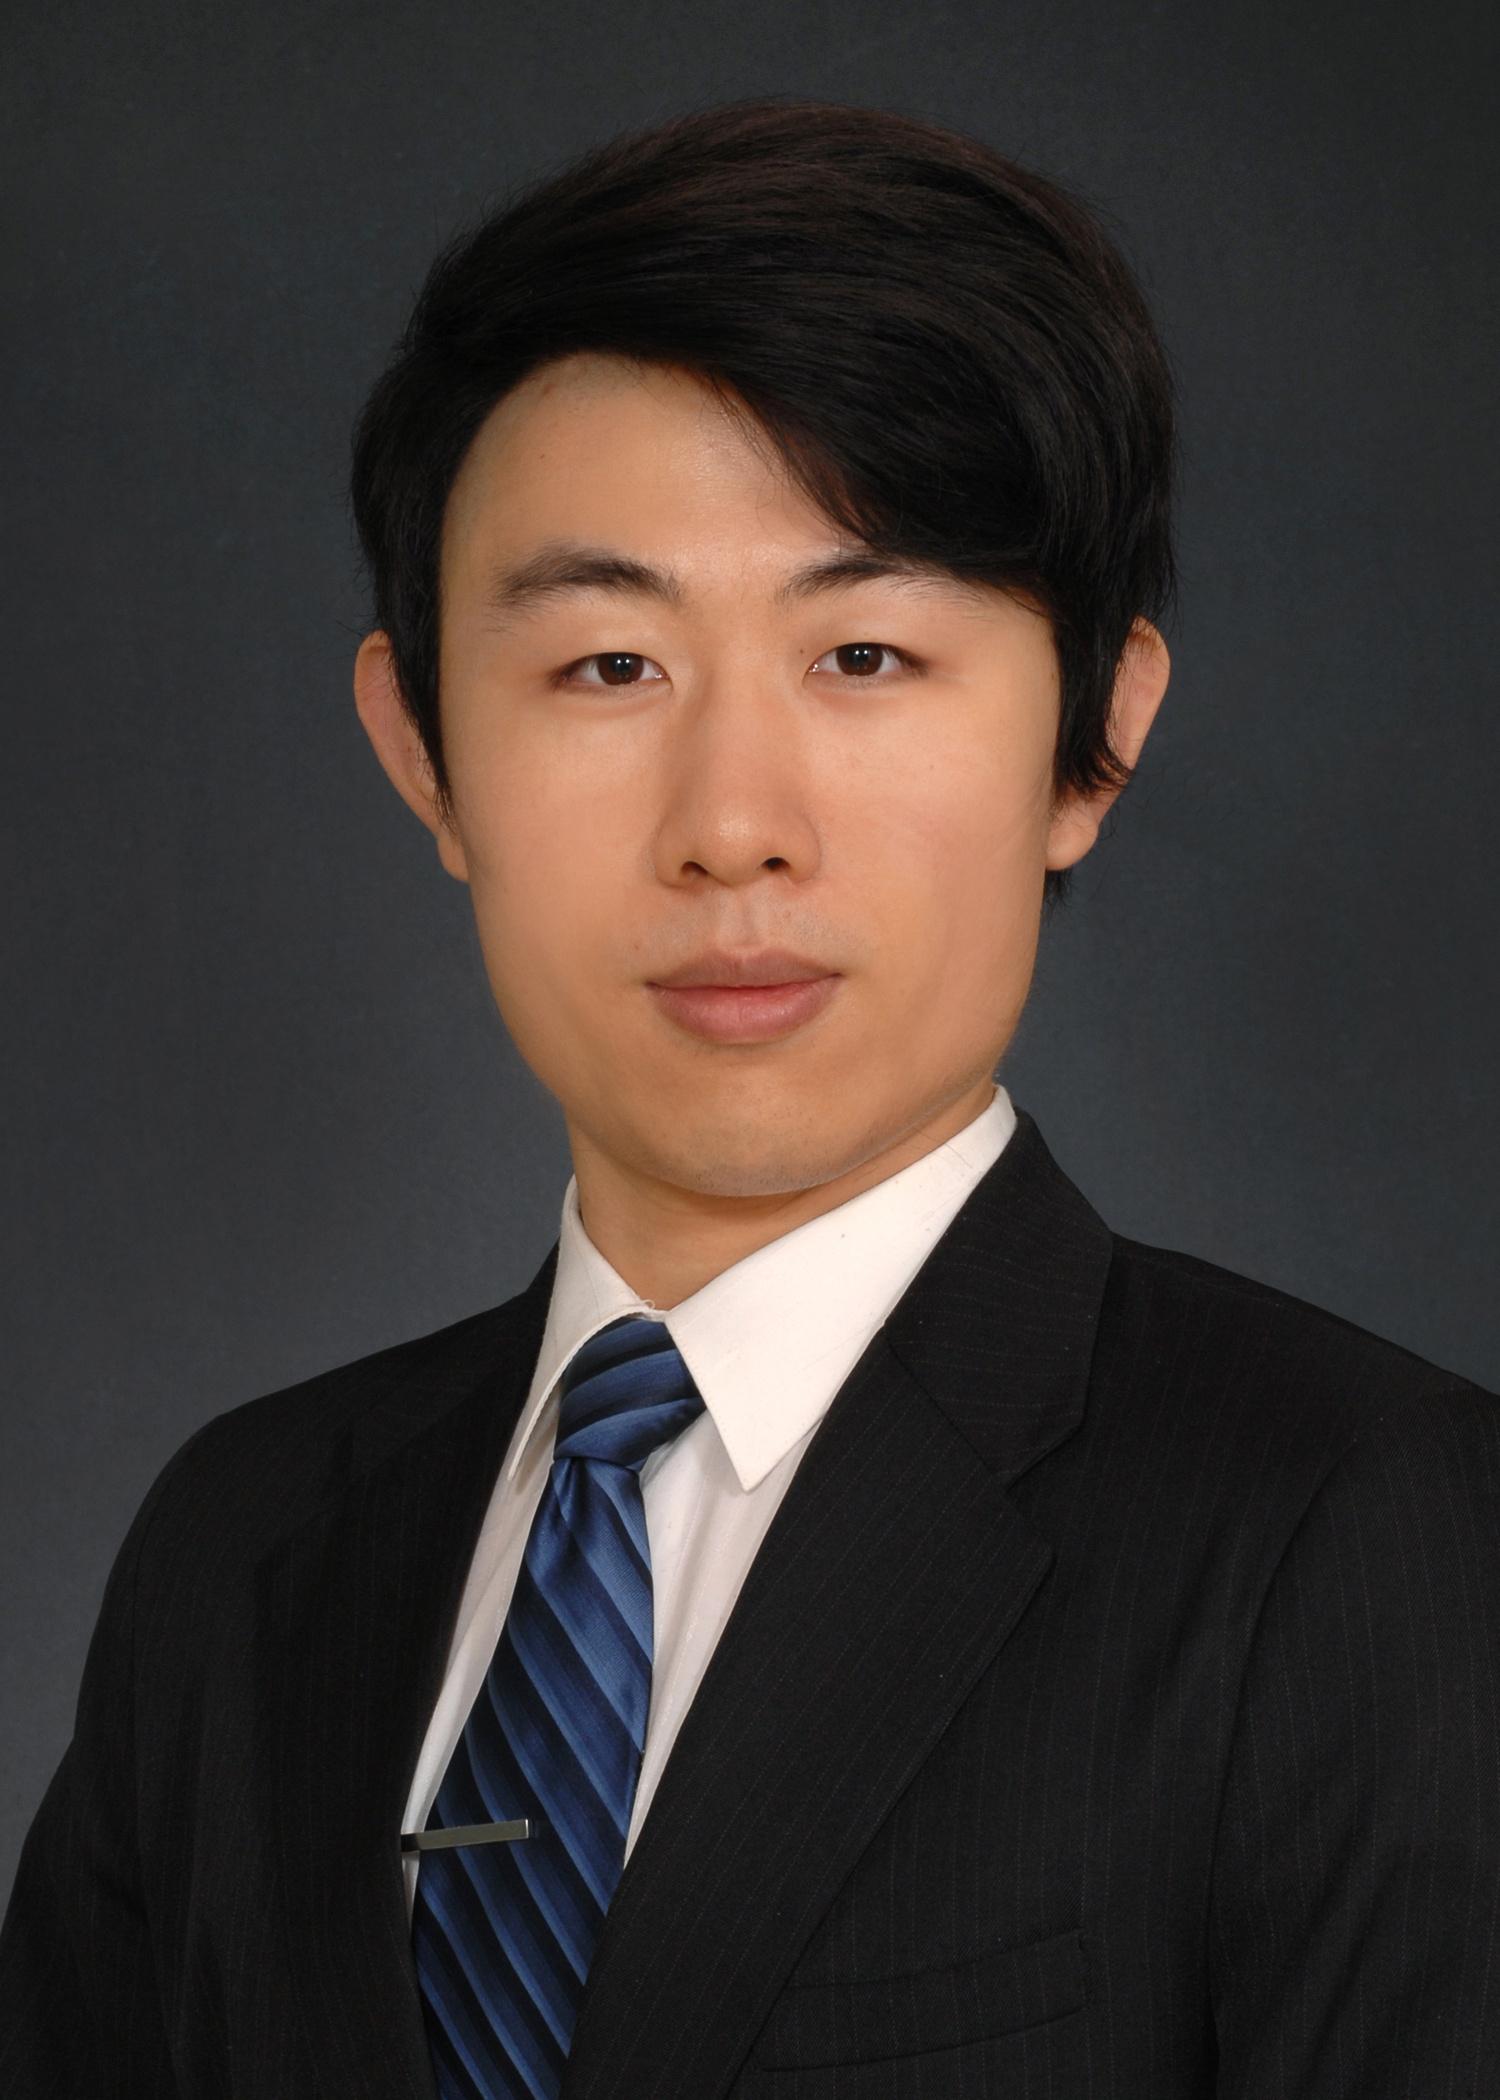 Xiong Peter